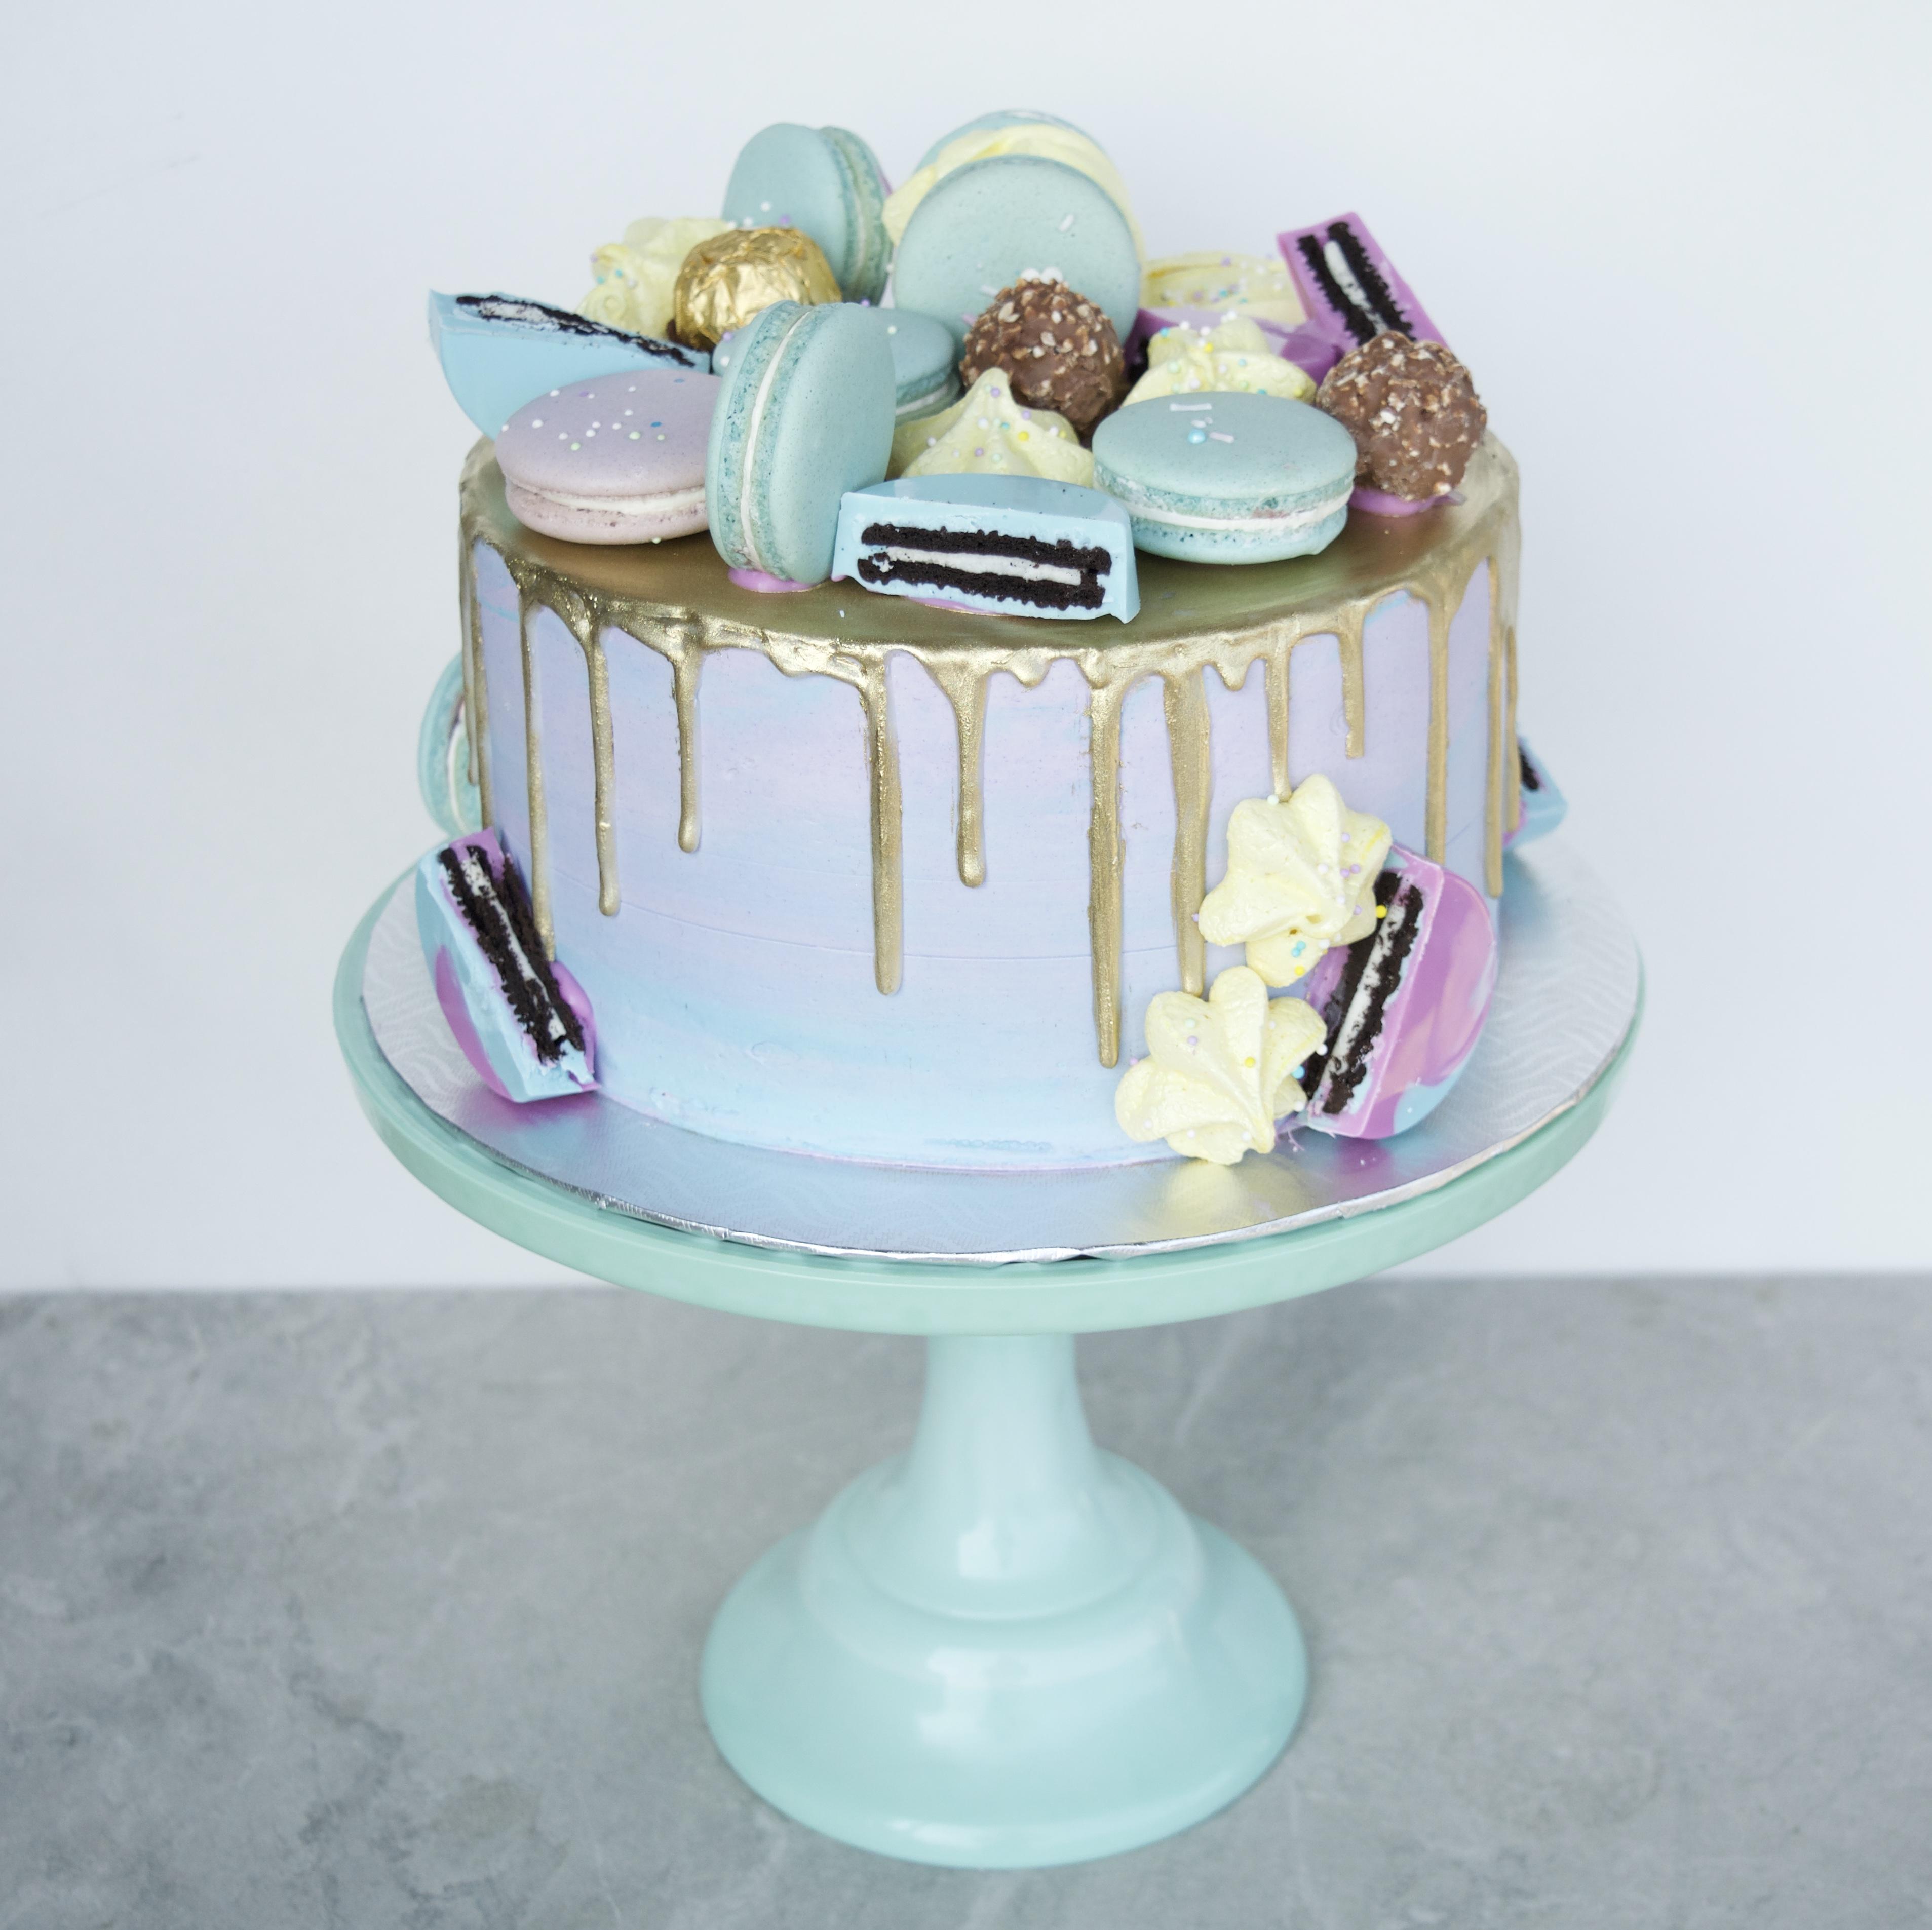 """Everything"" cake"